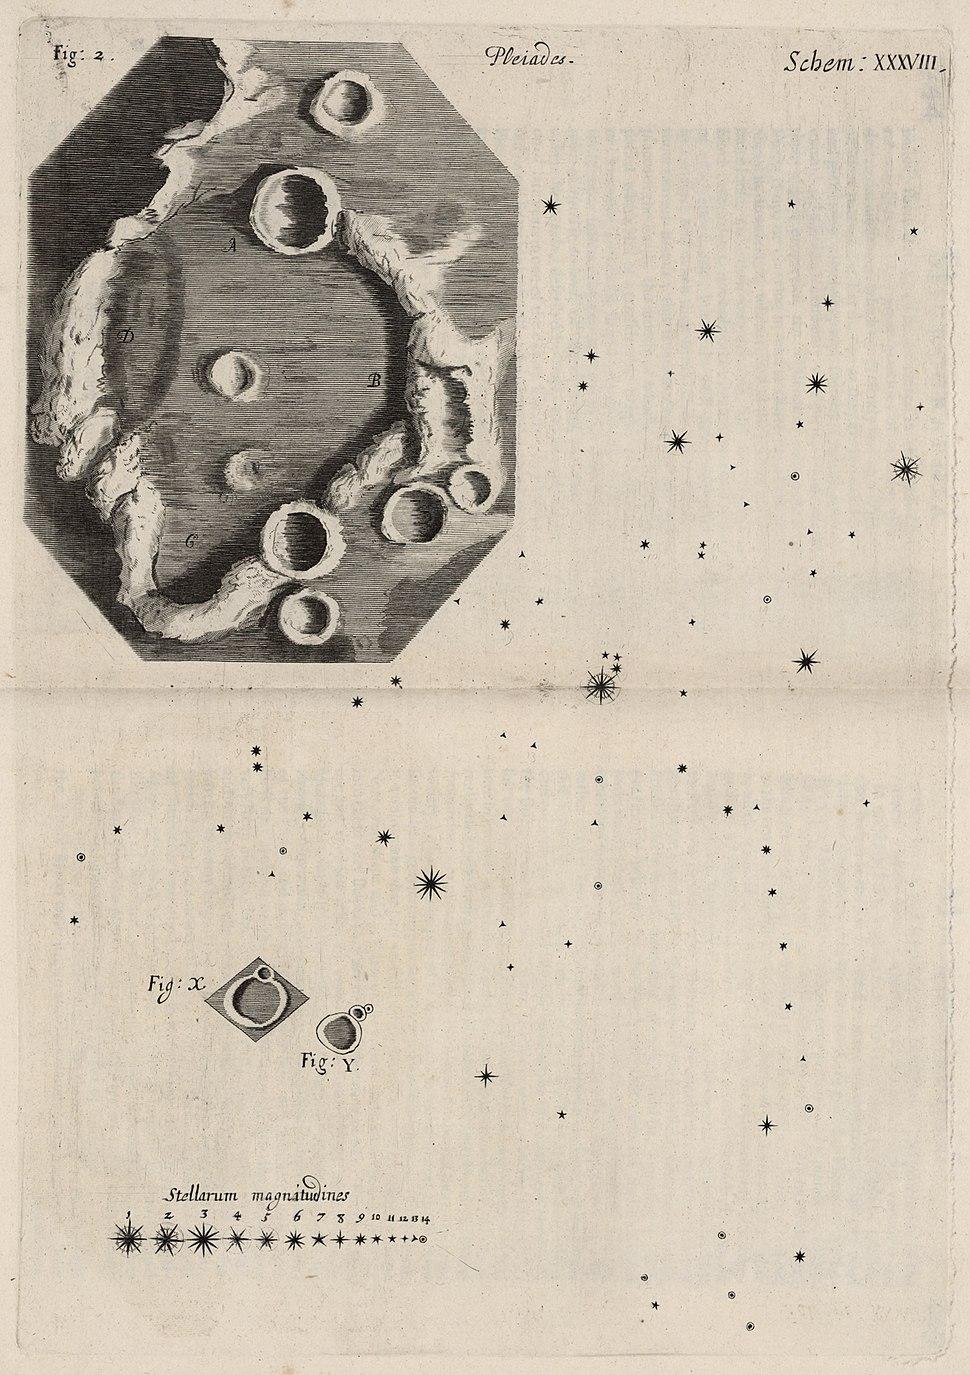 Micrographia Schem 38